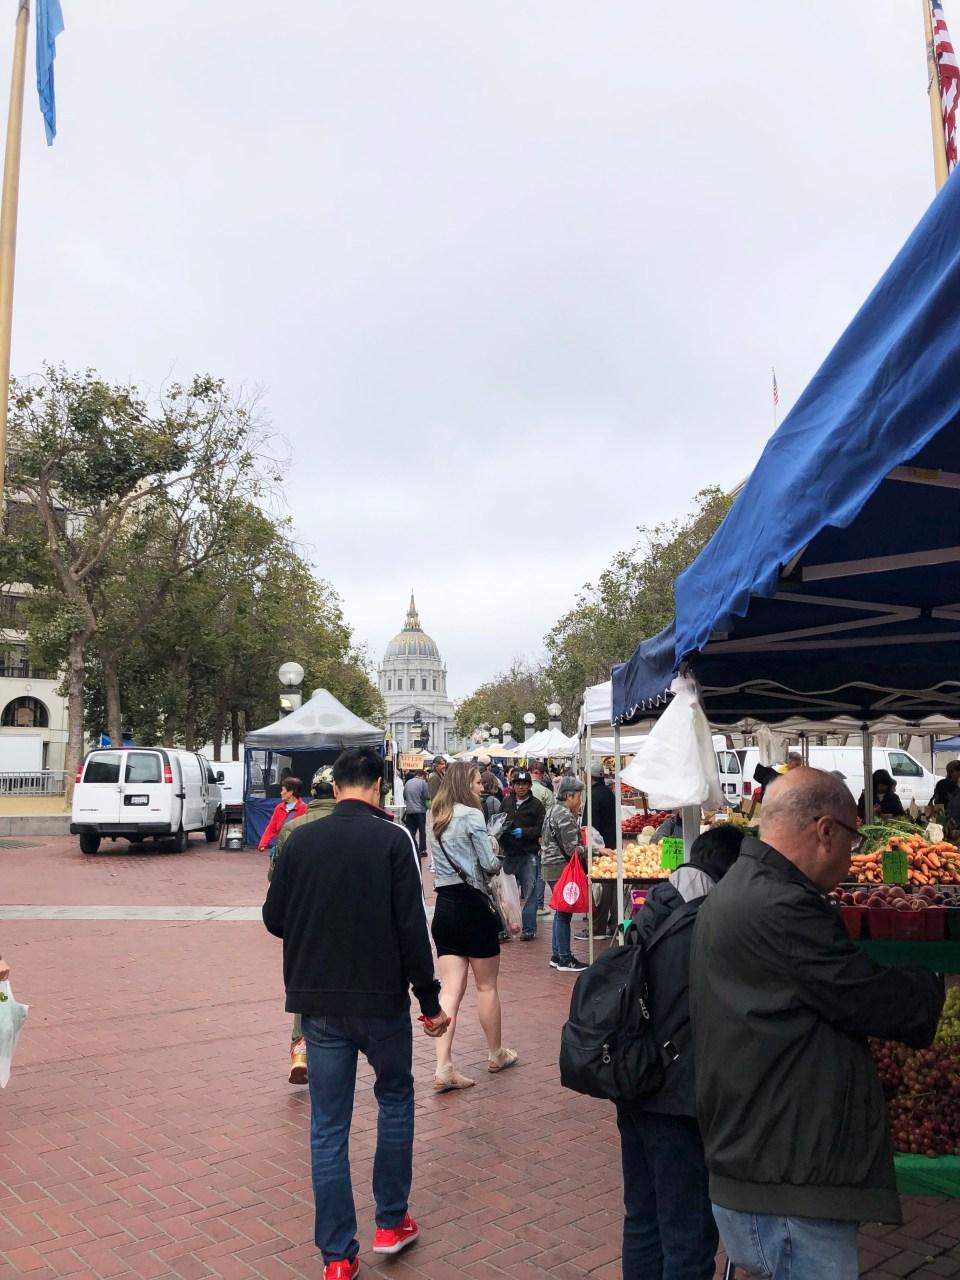 San Francisco - Farmer's Market